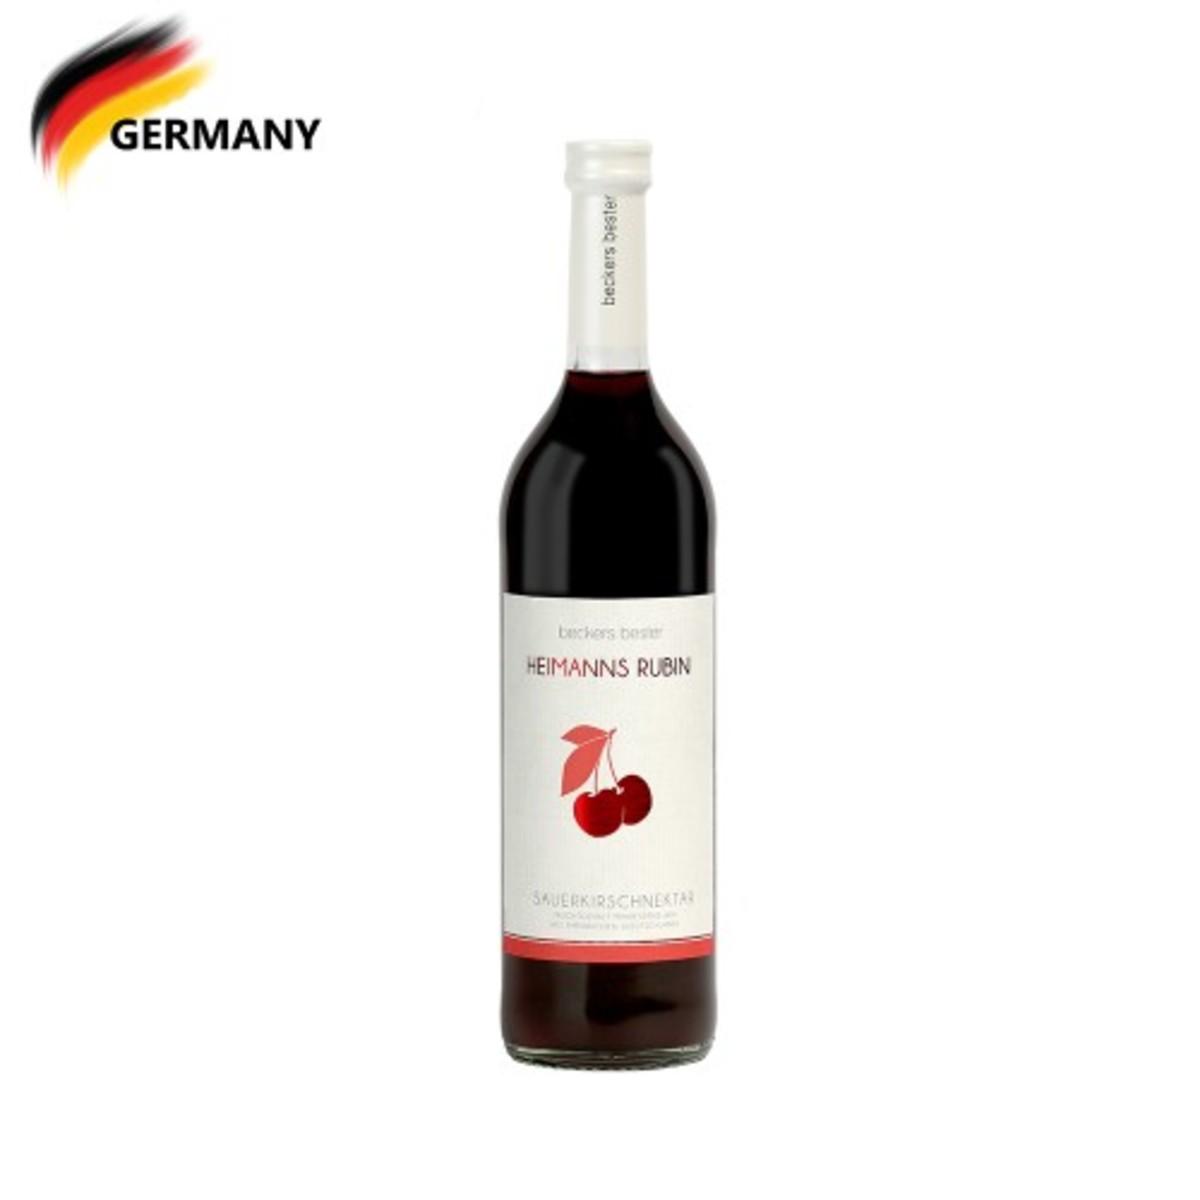 Single Origin Cherry Nectar - Heimanns Rubin (Germany - Lower Franconia) 700ml